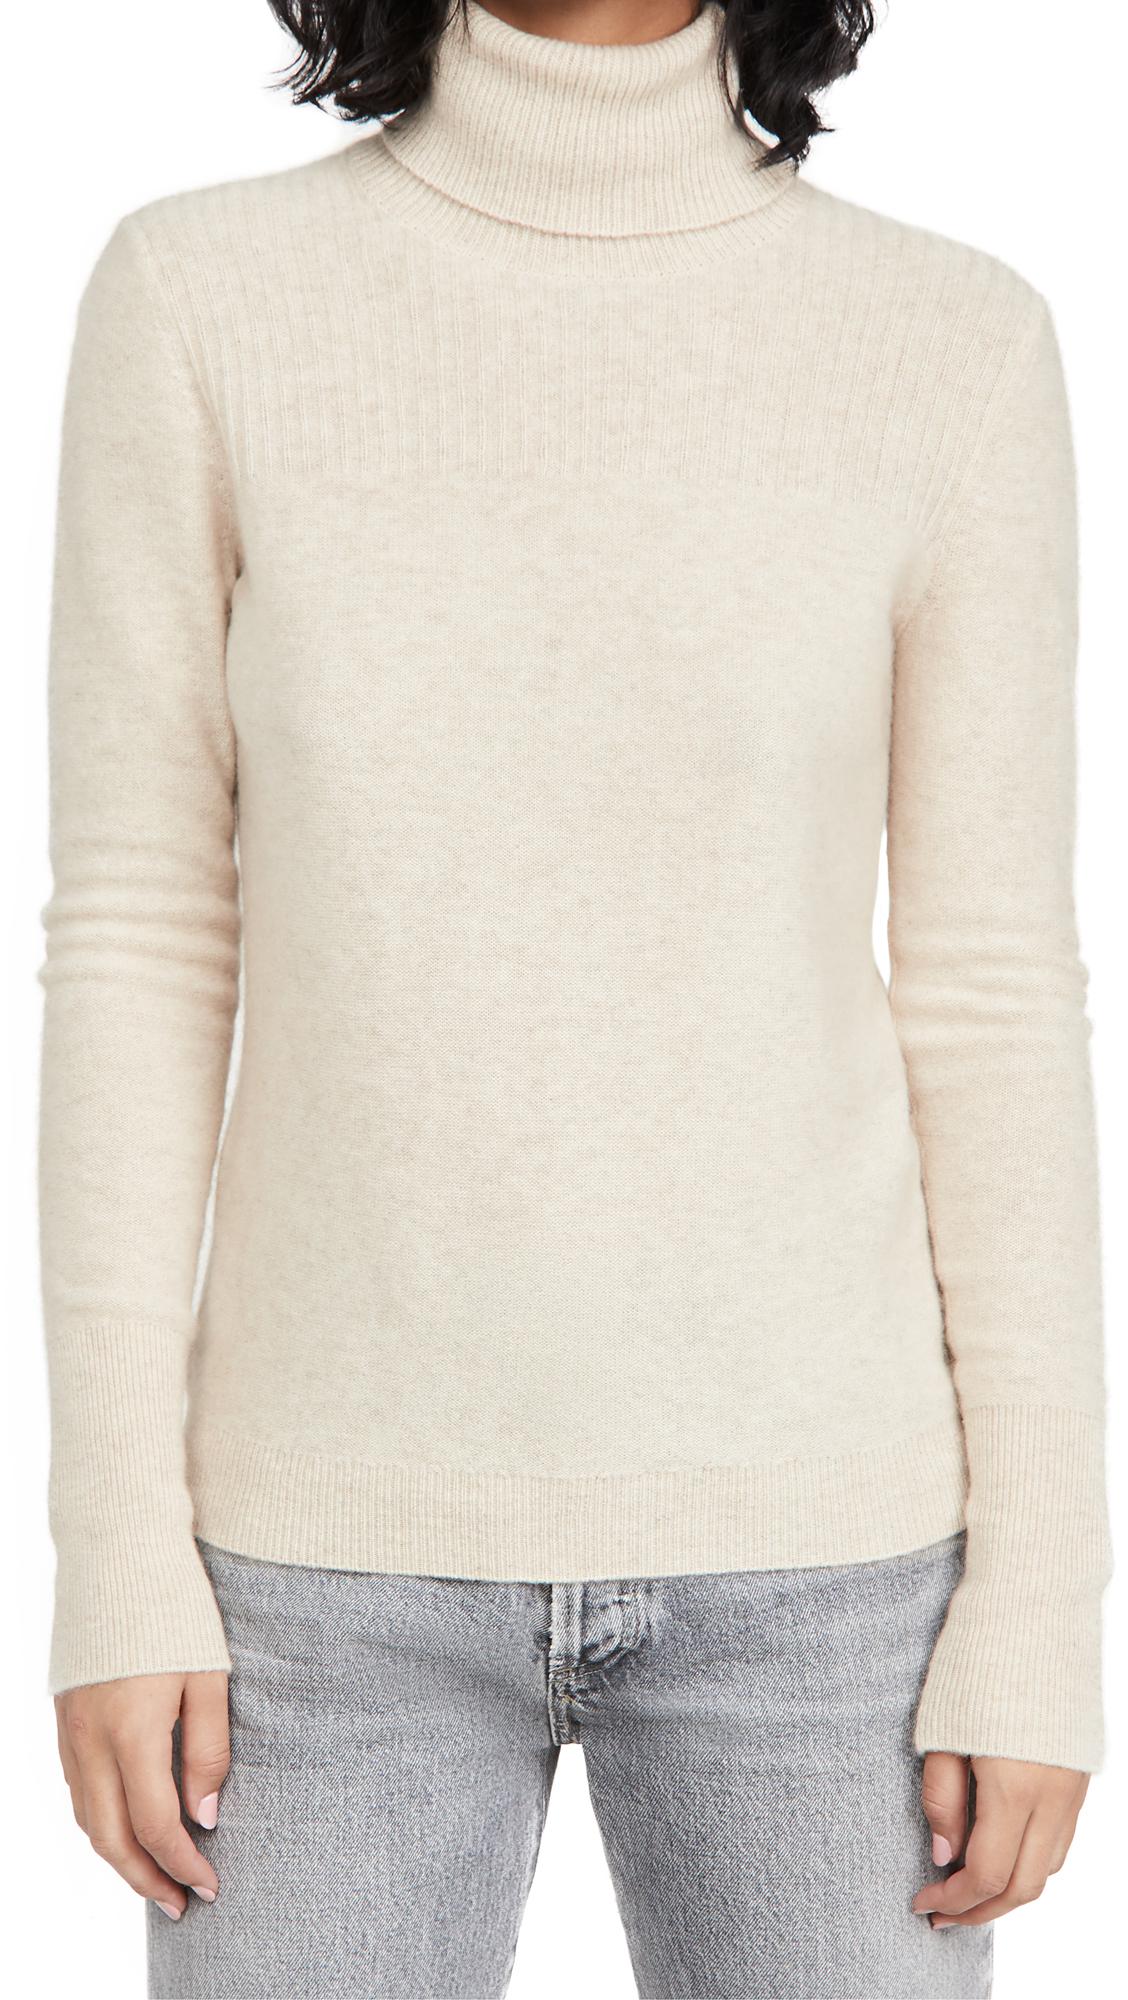 Veronica Beard Kressy Cashmere Turtleneck Sweater